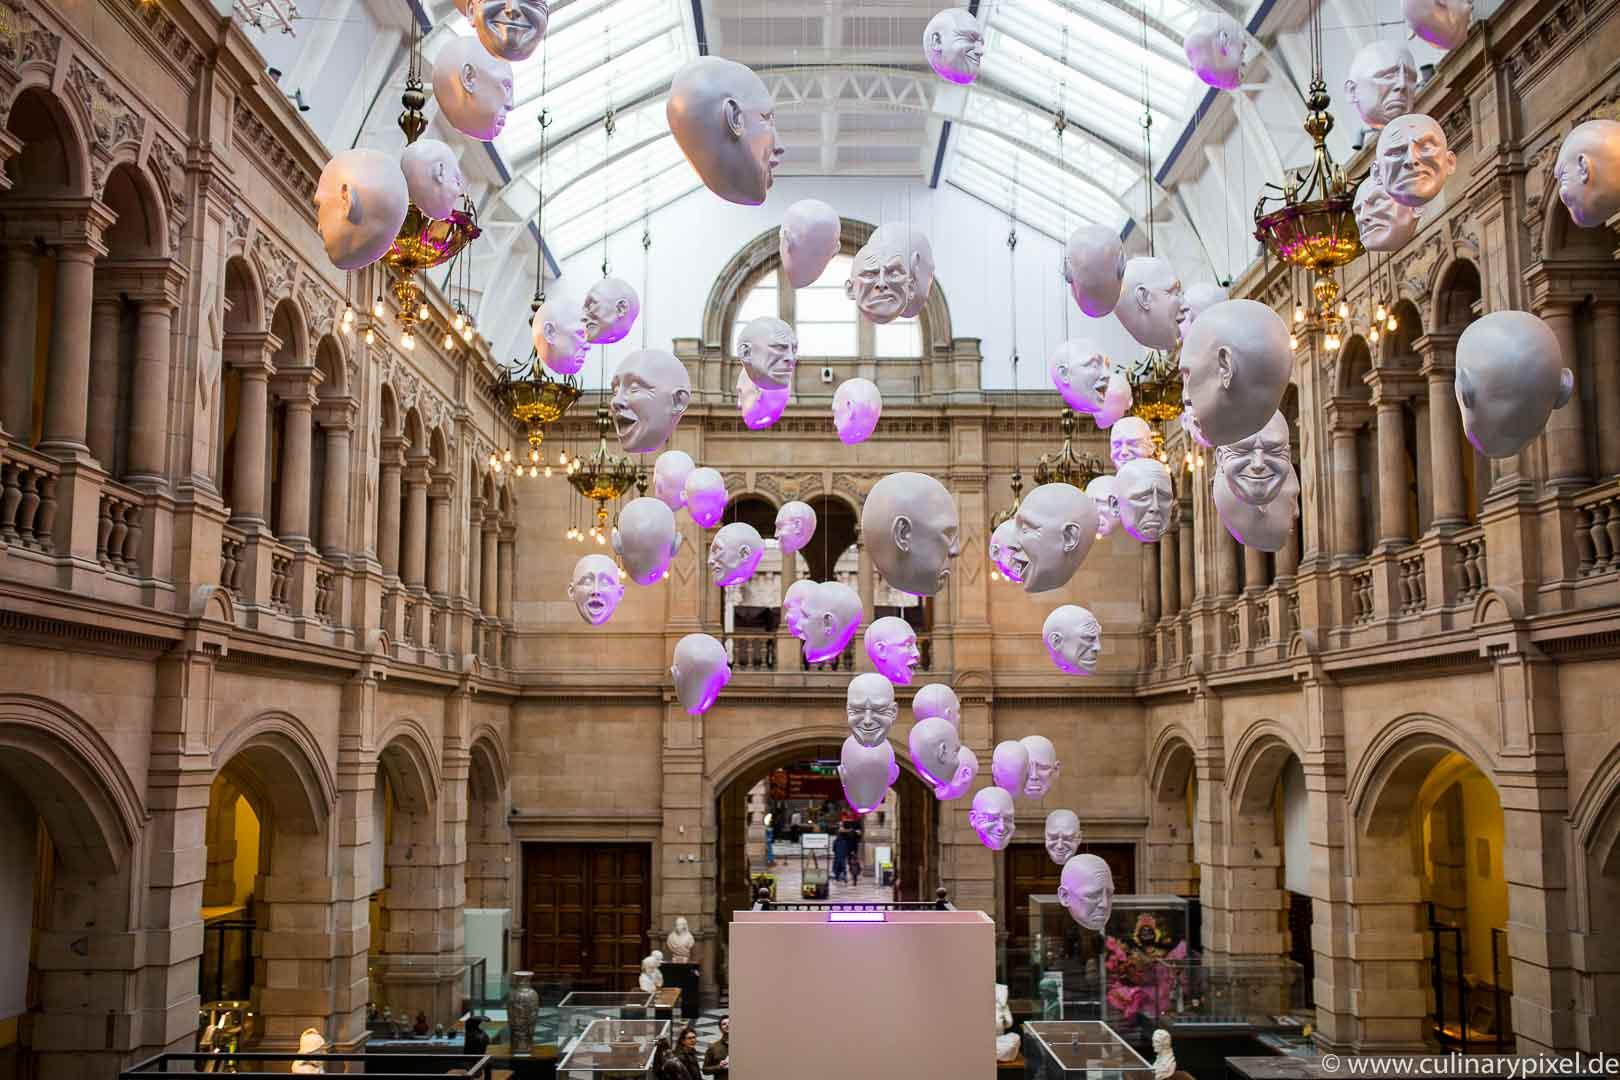 Glasgow Kelvingrove Museum